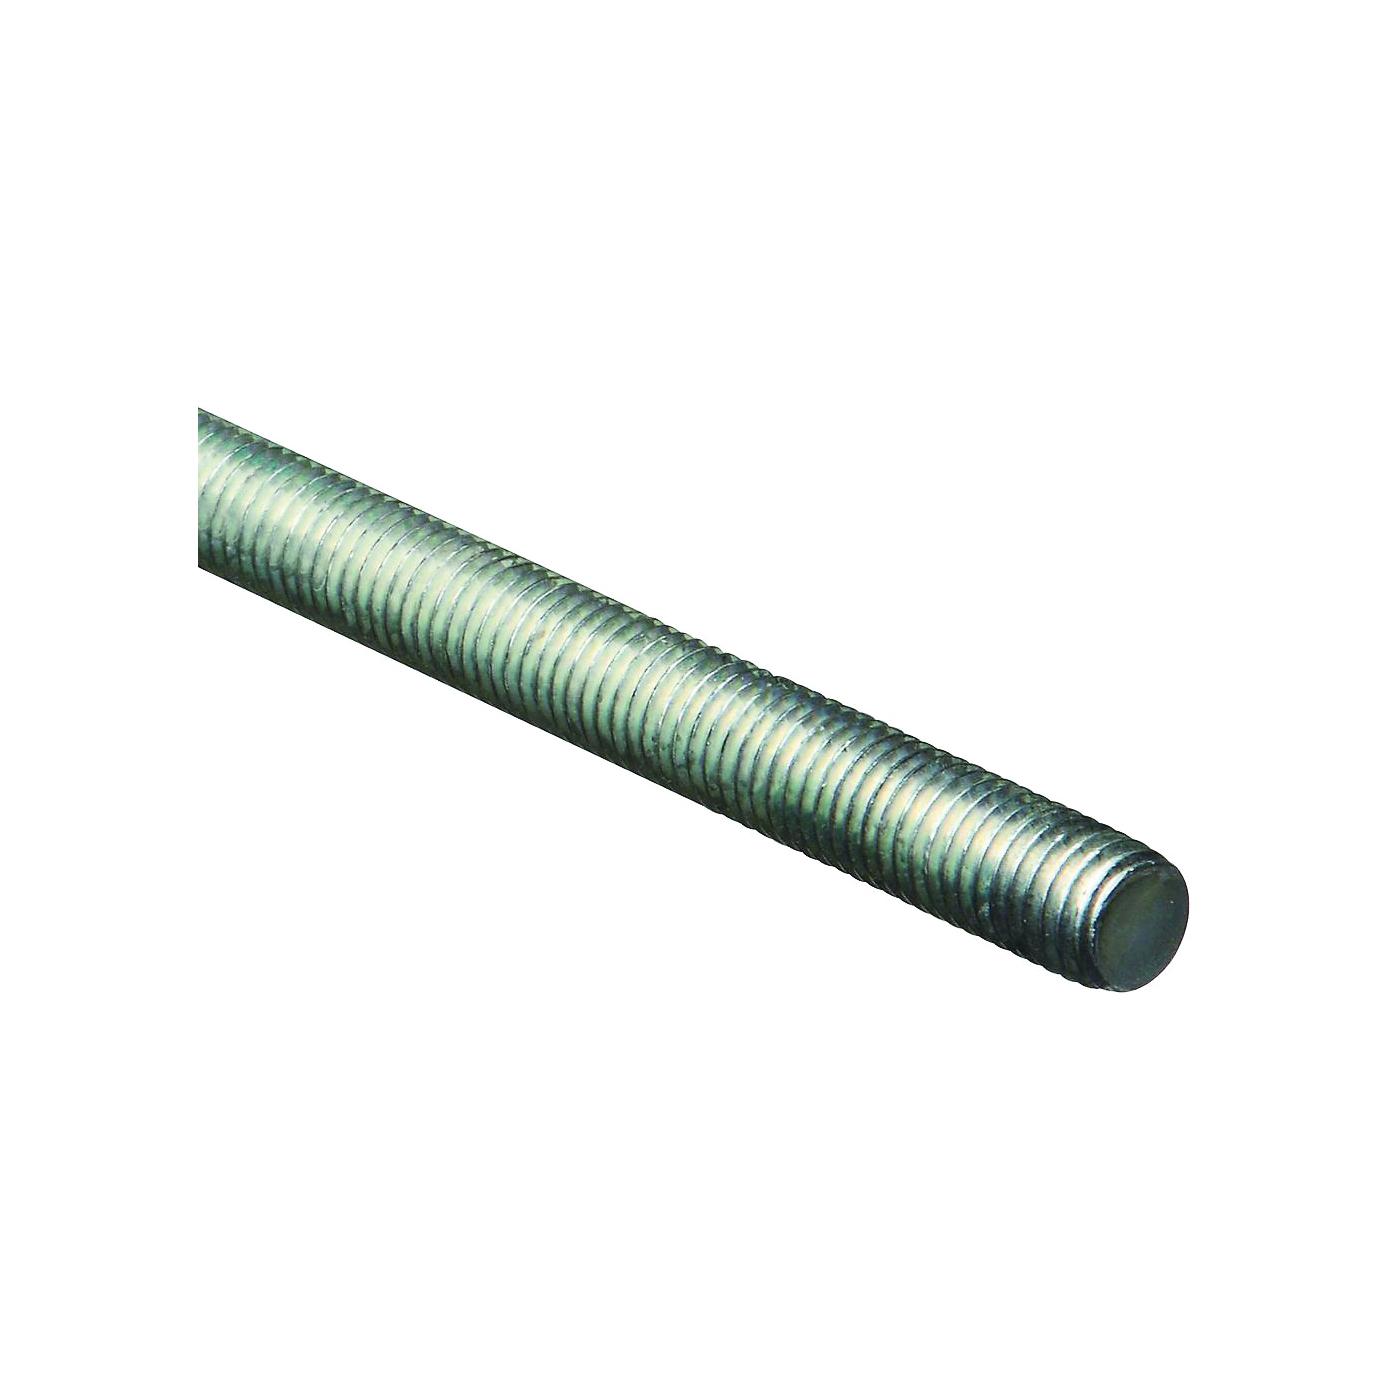 Picture of Stanley Hardware 179531 Threaded Rod, 1/2-13 Thread, 36 in L, A Grade, Steel, Zinc, UNC Thread